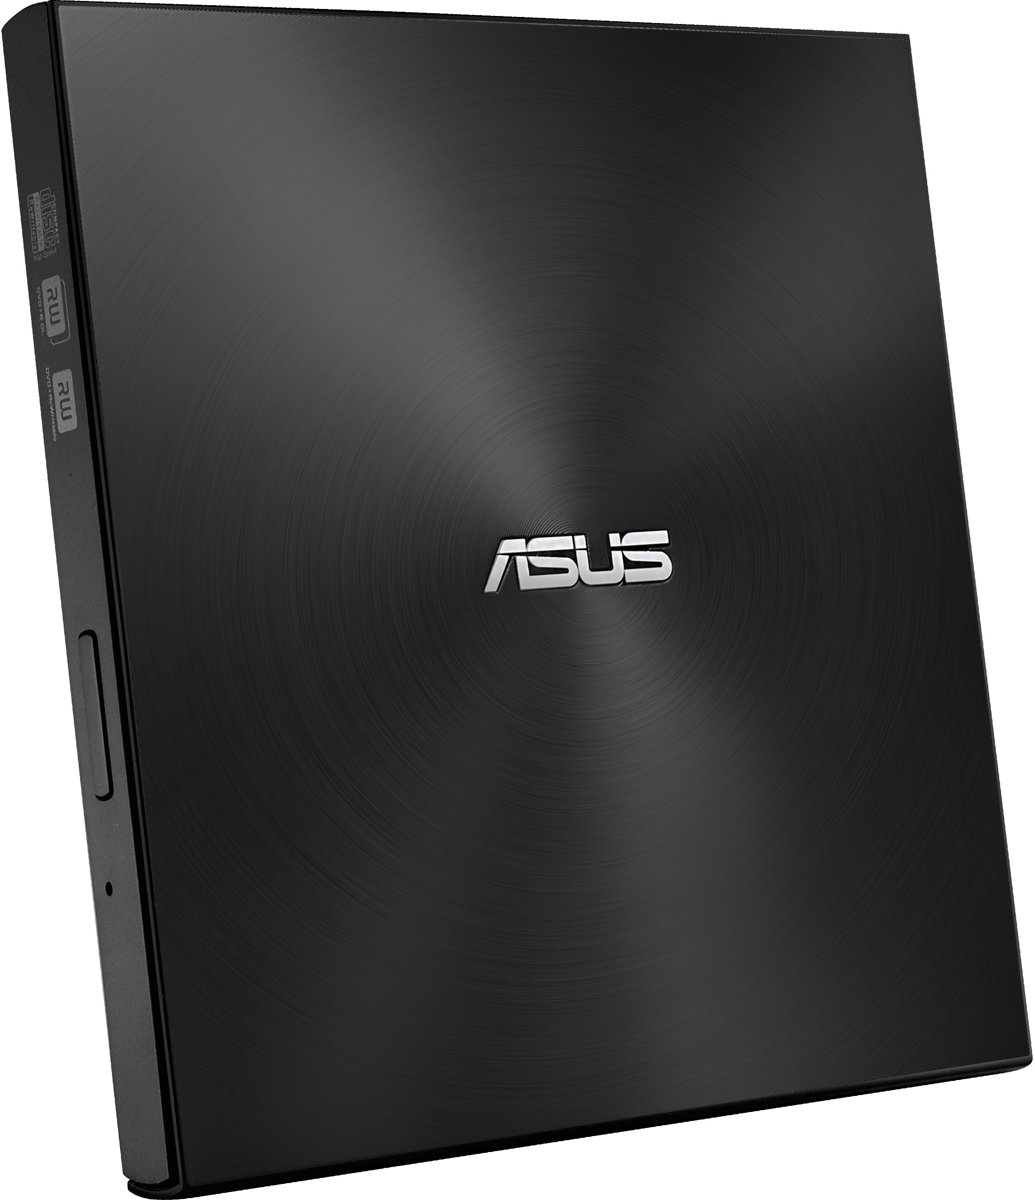 Asus ZenDrive U7M SDRW-08U7M-U ZD Externe DVD-brander Retail USB 2.0 Zwart